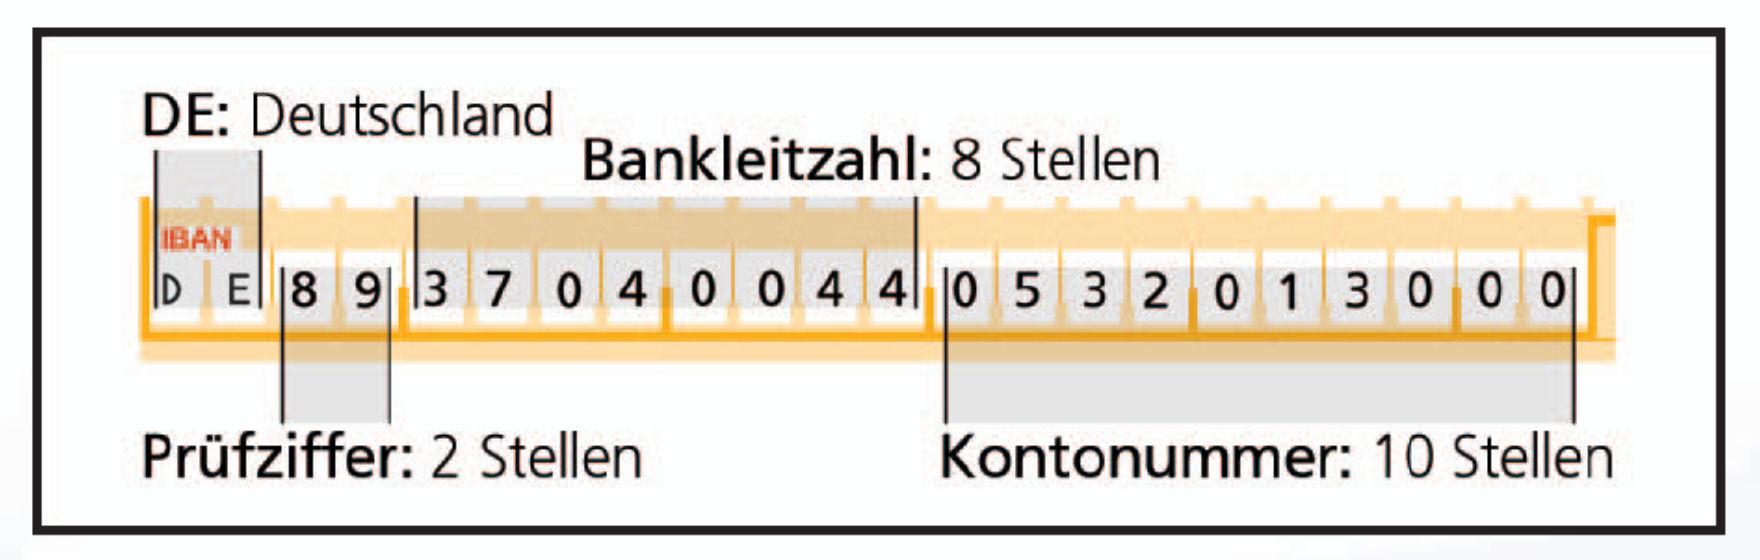 Beispiel IBAN (International Bank Account Number)